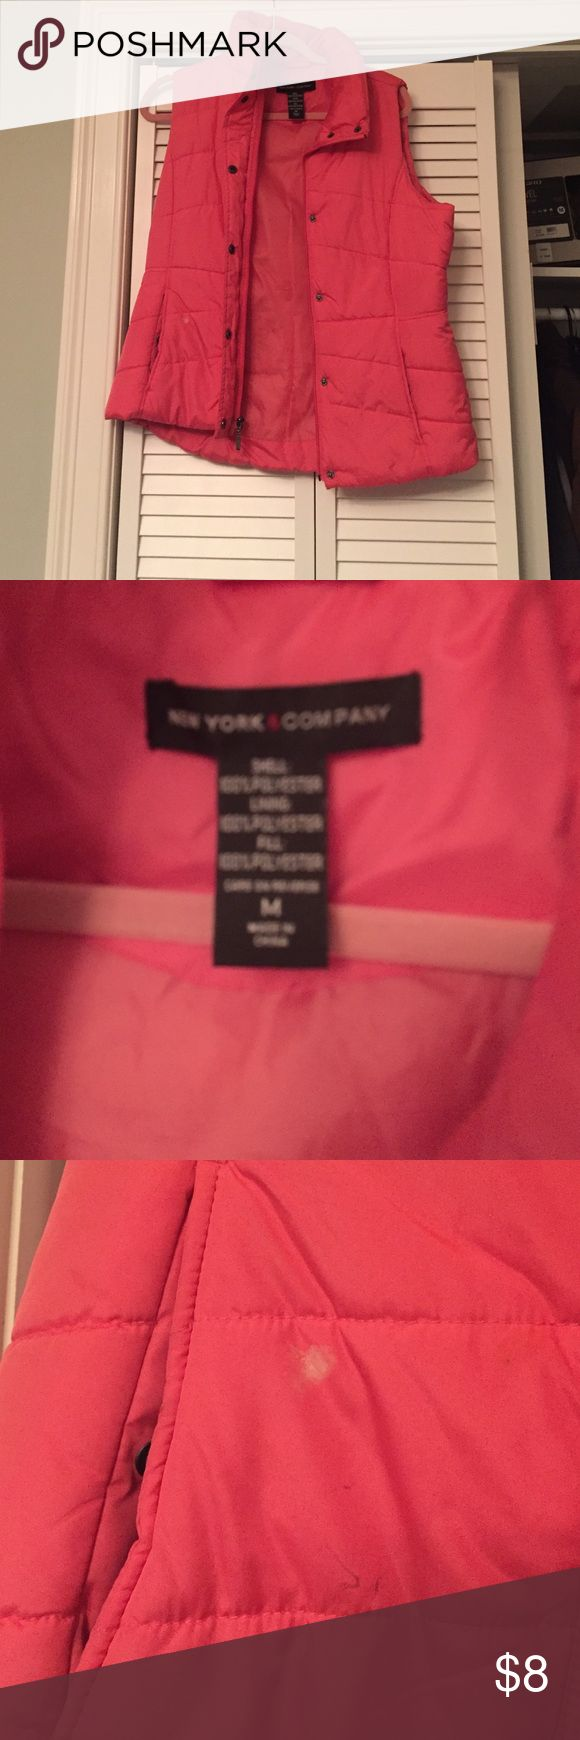 Pink vest size medium pink vest Pink vest size medium pink vest Small white stain near pocket New York & Company Jackets & Coats Vests